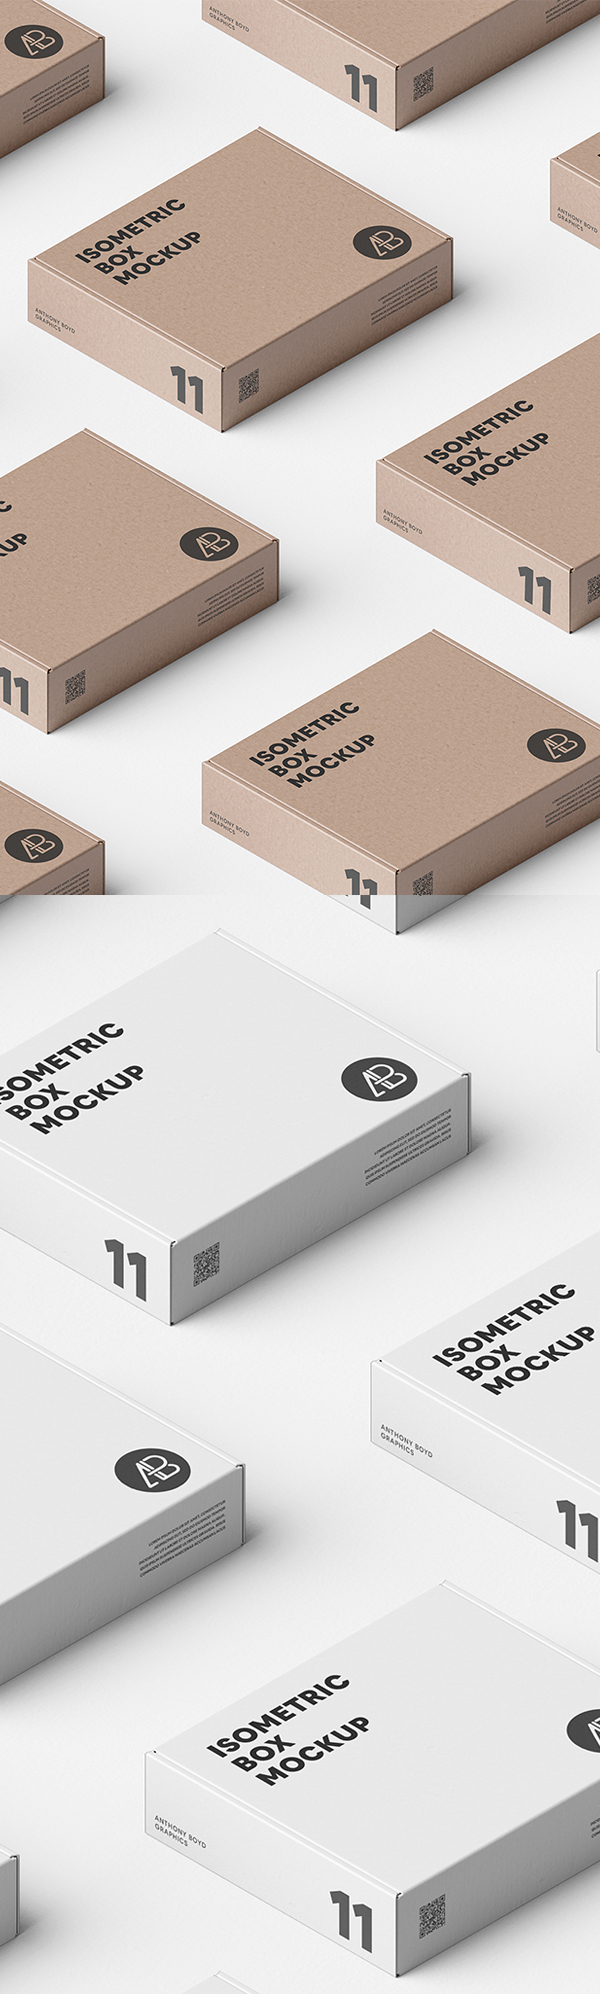 Free Box Grid Mockup